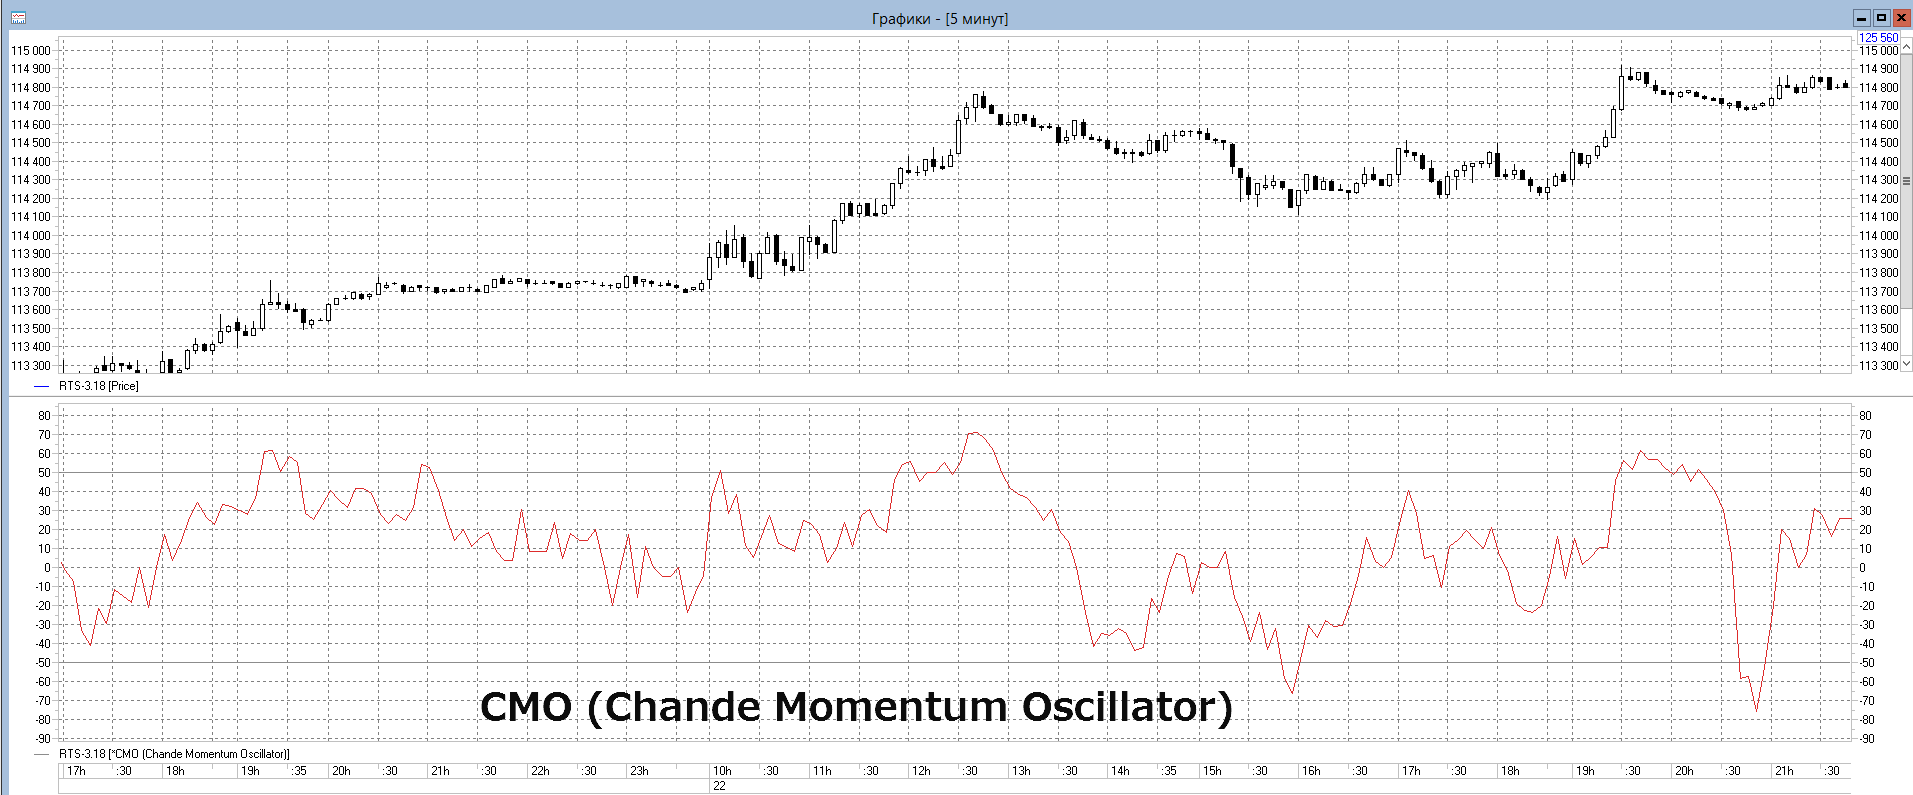 CMO-Chande-Momentum-Oscillator